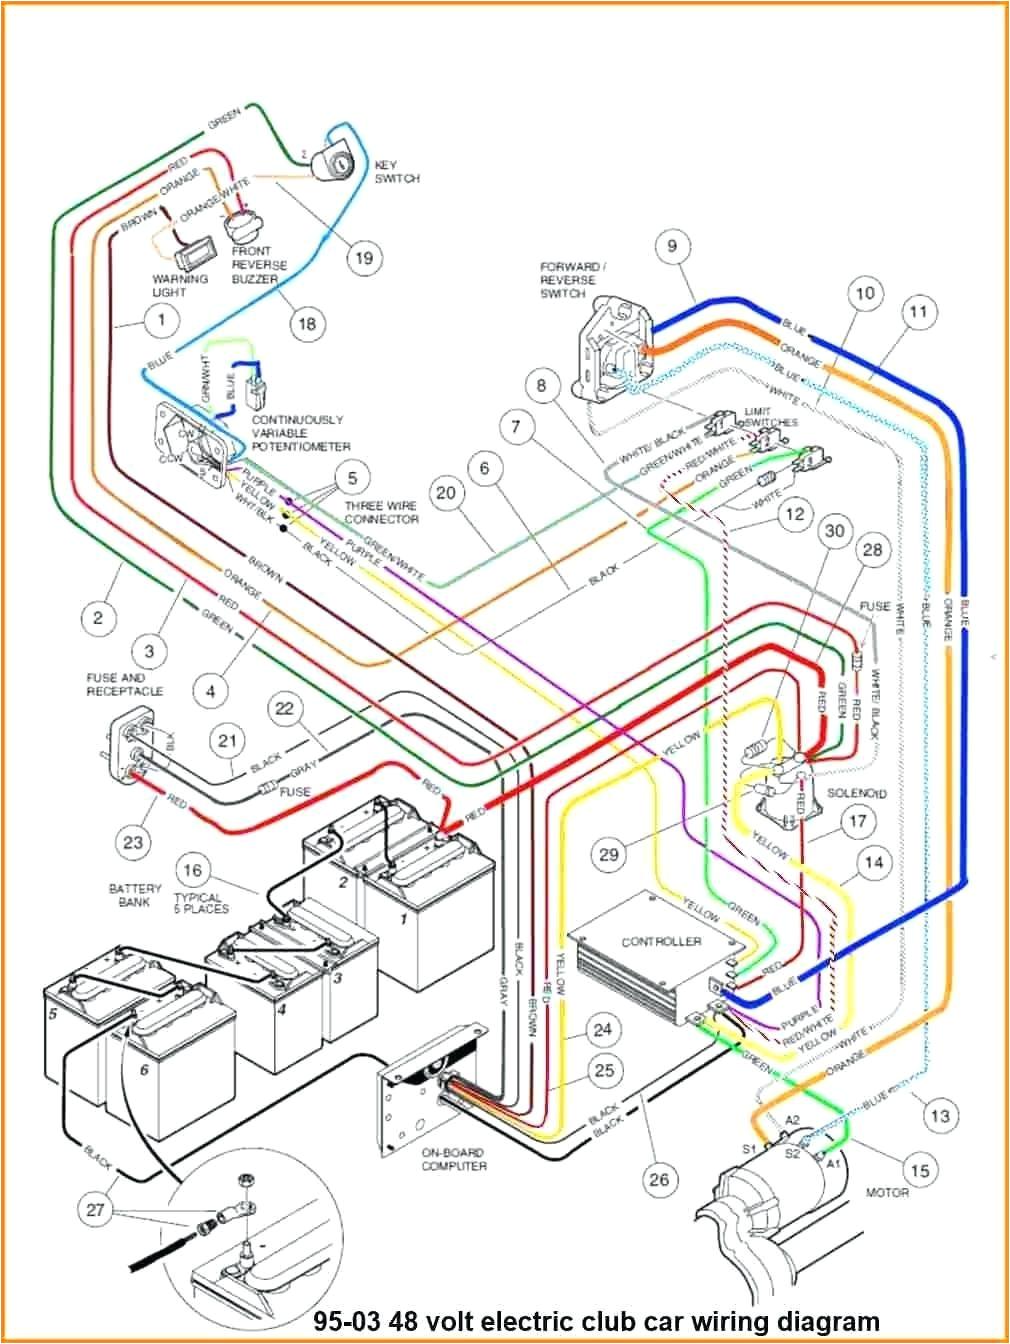 battery wiring diagram club car champions edition data wiring diagram battery wiring diagram club car champions edition source 2008 ds